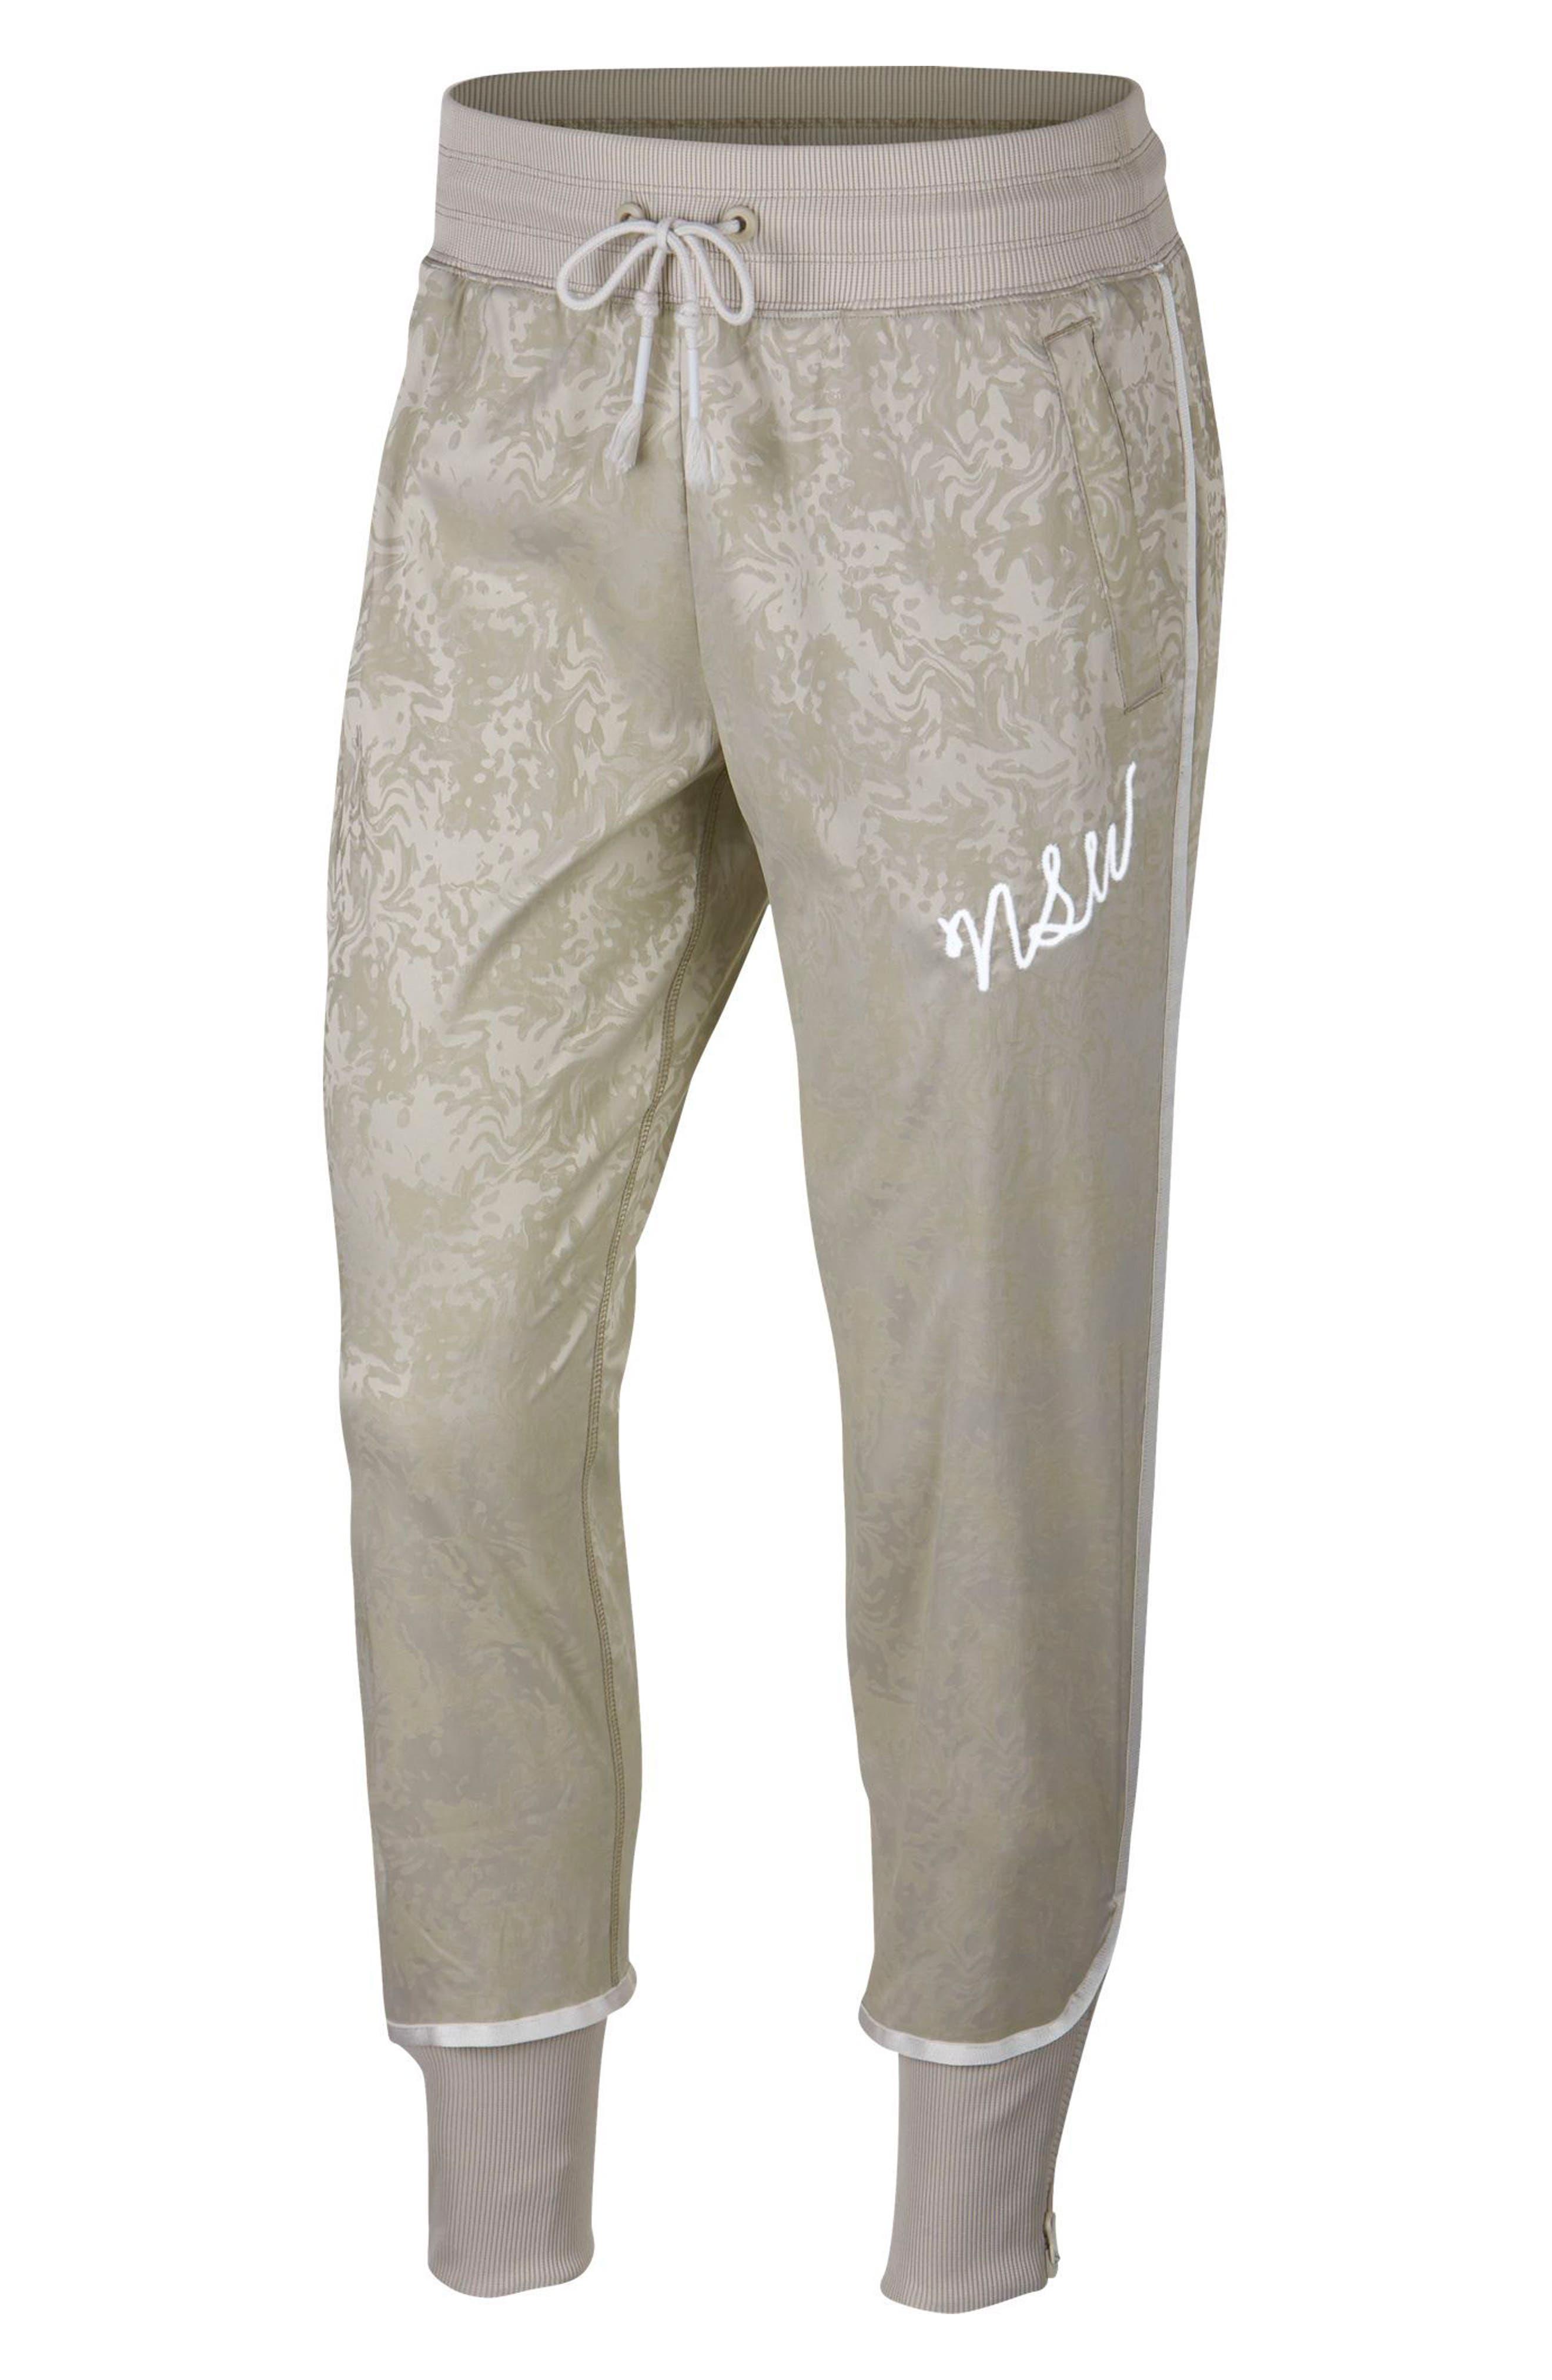 Sportswear NSW Women's Track Pants,                             Main thumbnail 1, color,                             STRING/ PHANTOM/ WHITE